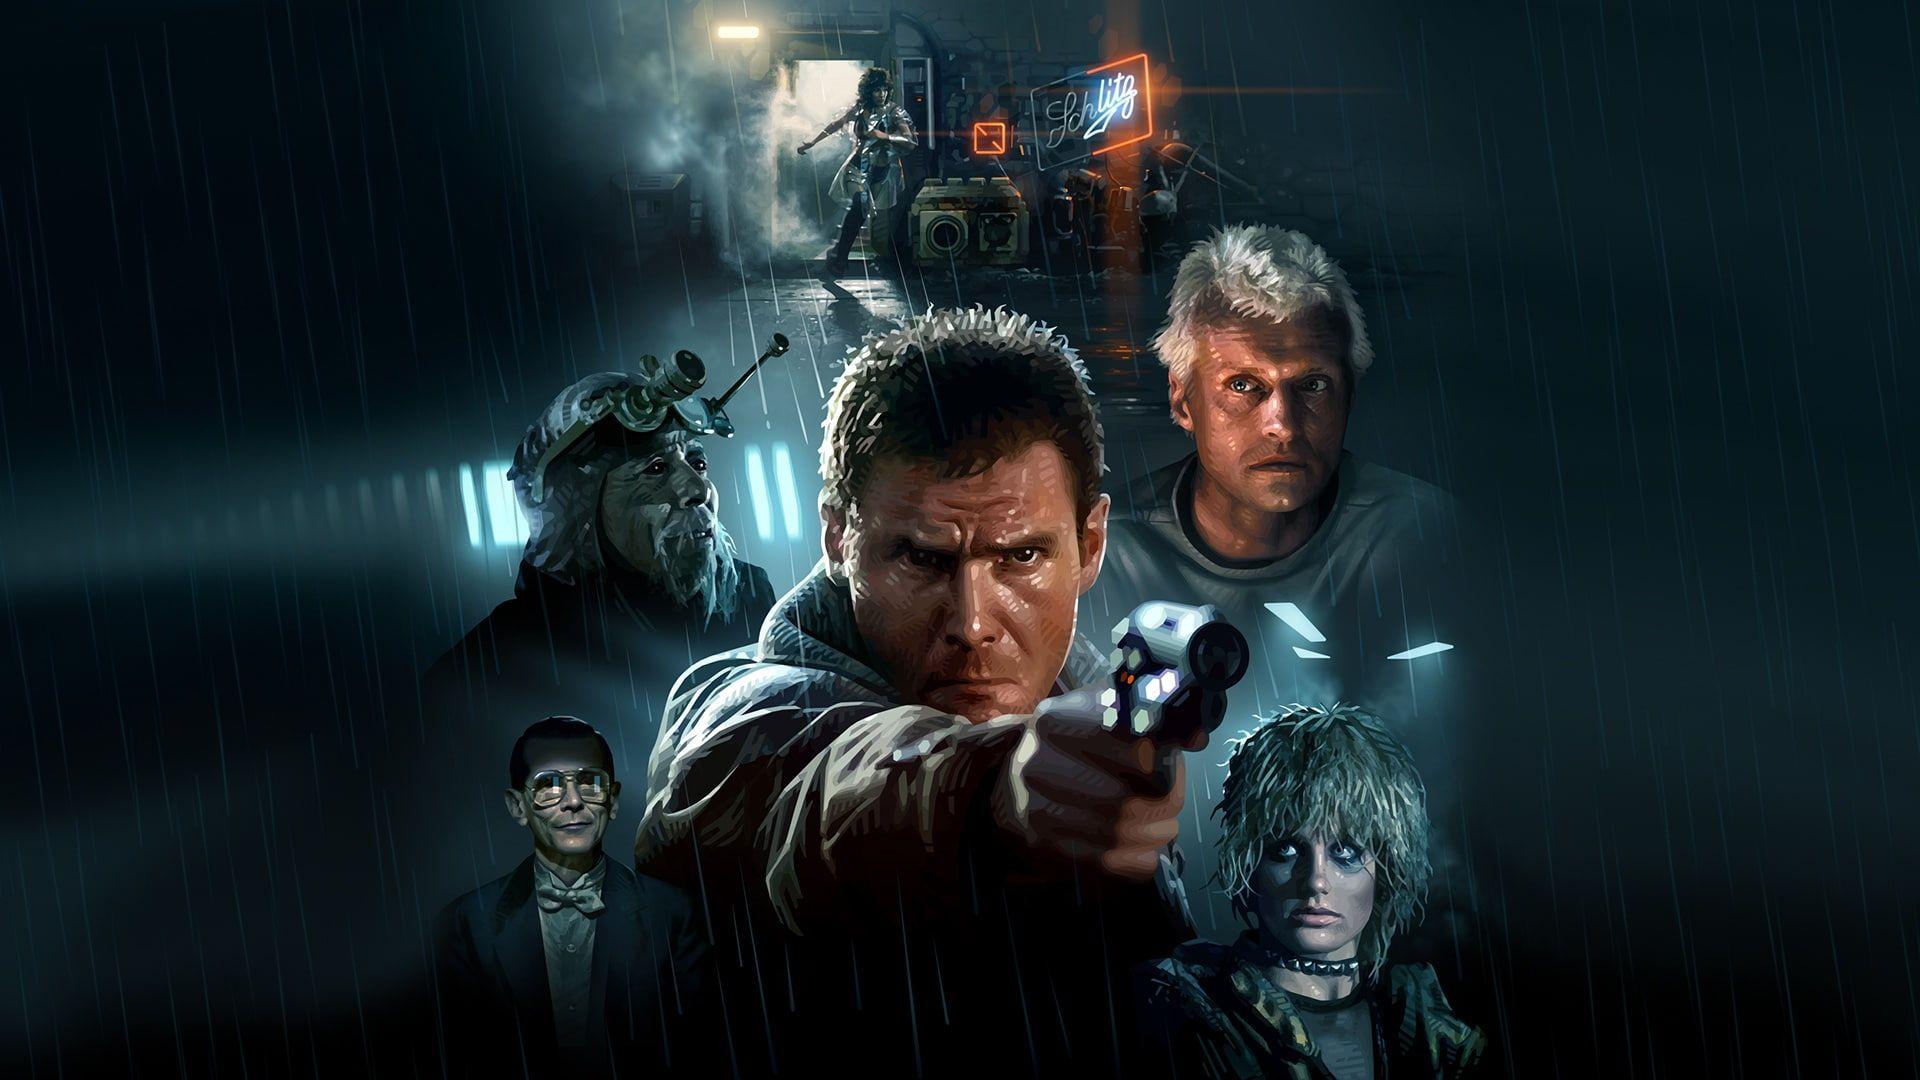 Harrison Ford Blade Runner Cyberpunk 1080p Wallpaper Hdwallpaper Desktop Harrison Ford Blade Runner Harrison Ford Blade Runner